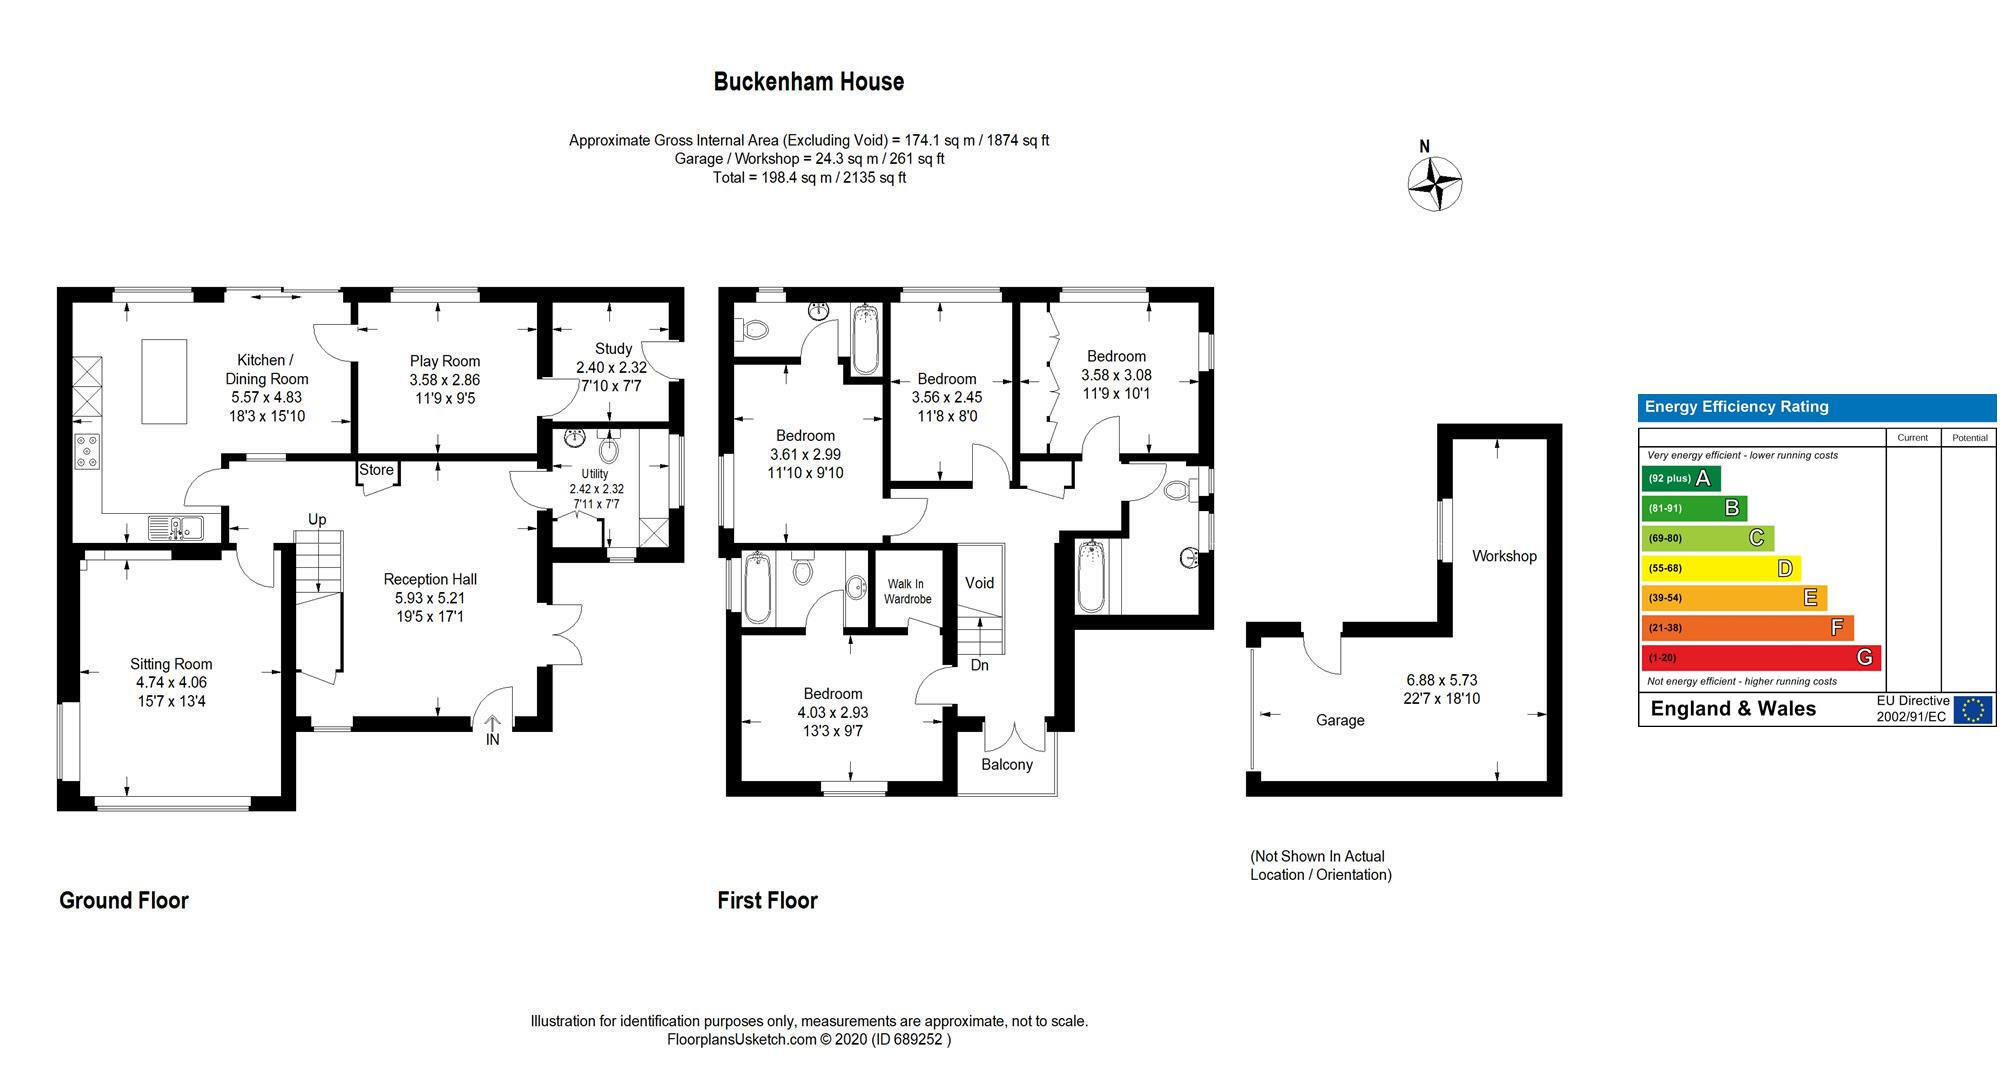 Buckenham House brochure